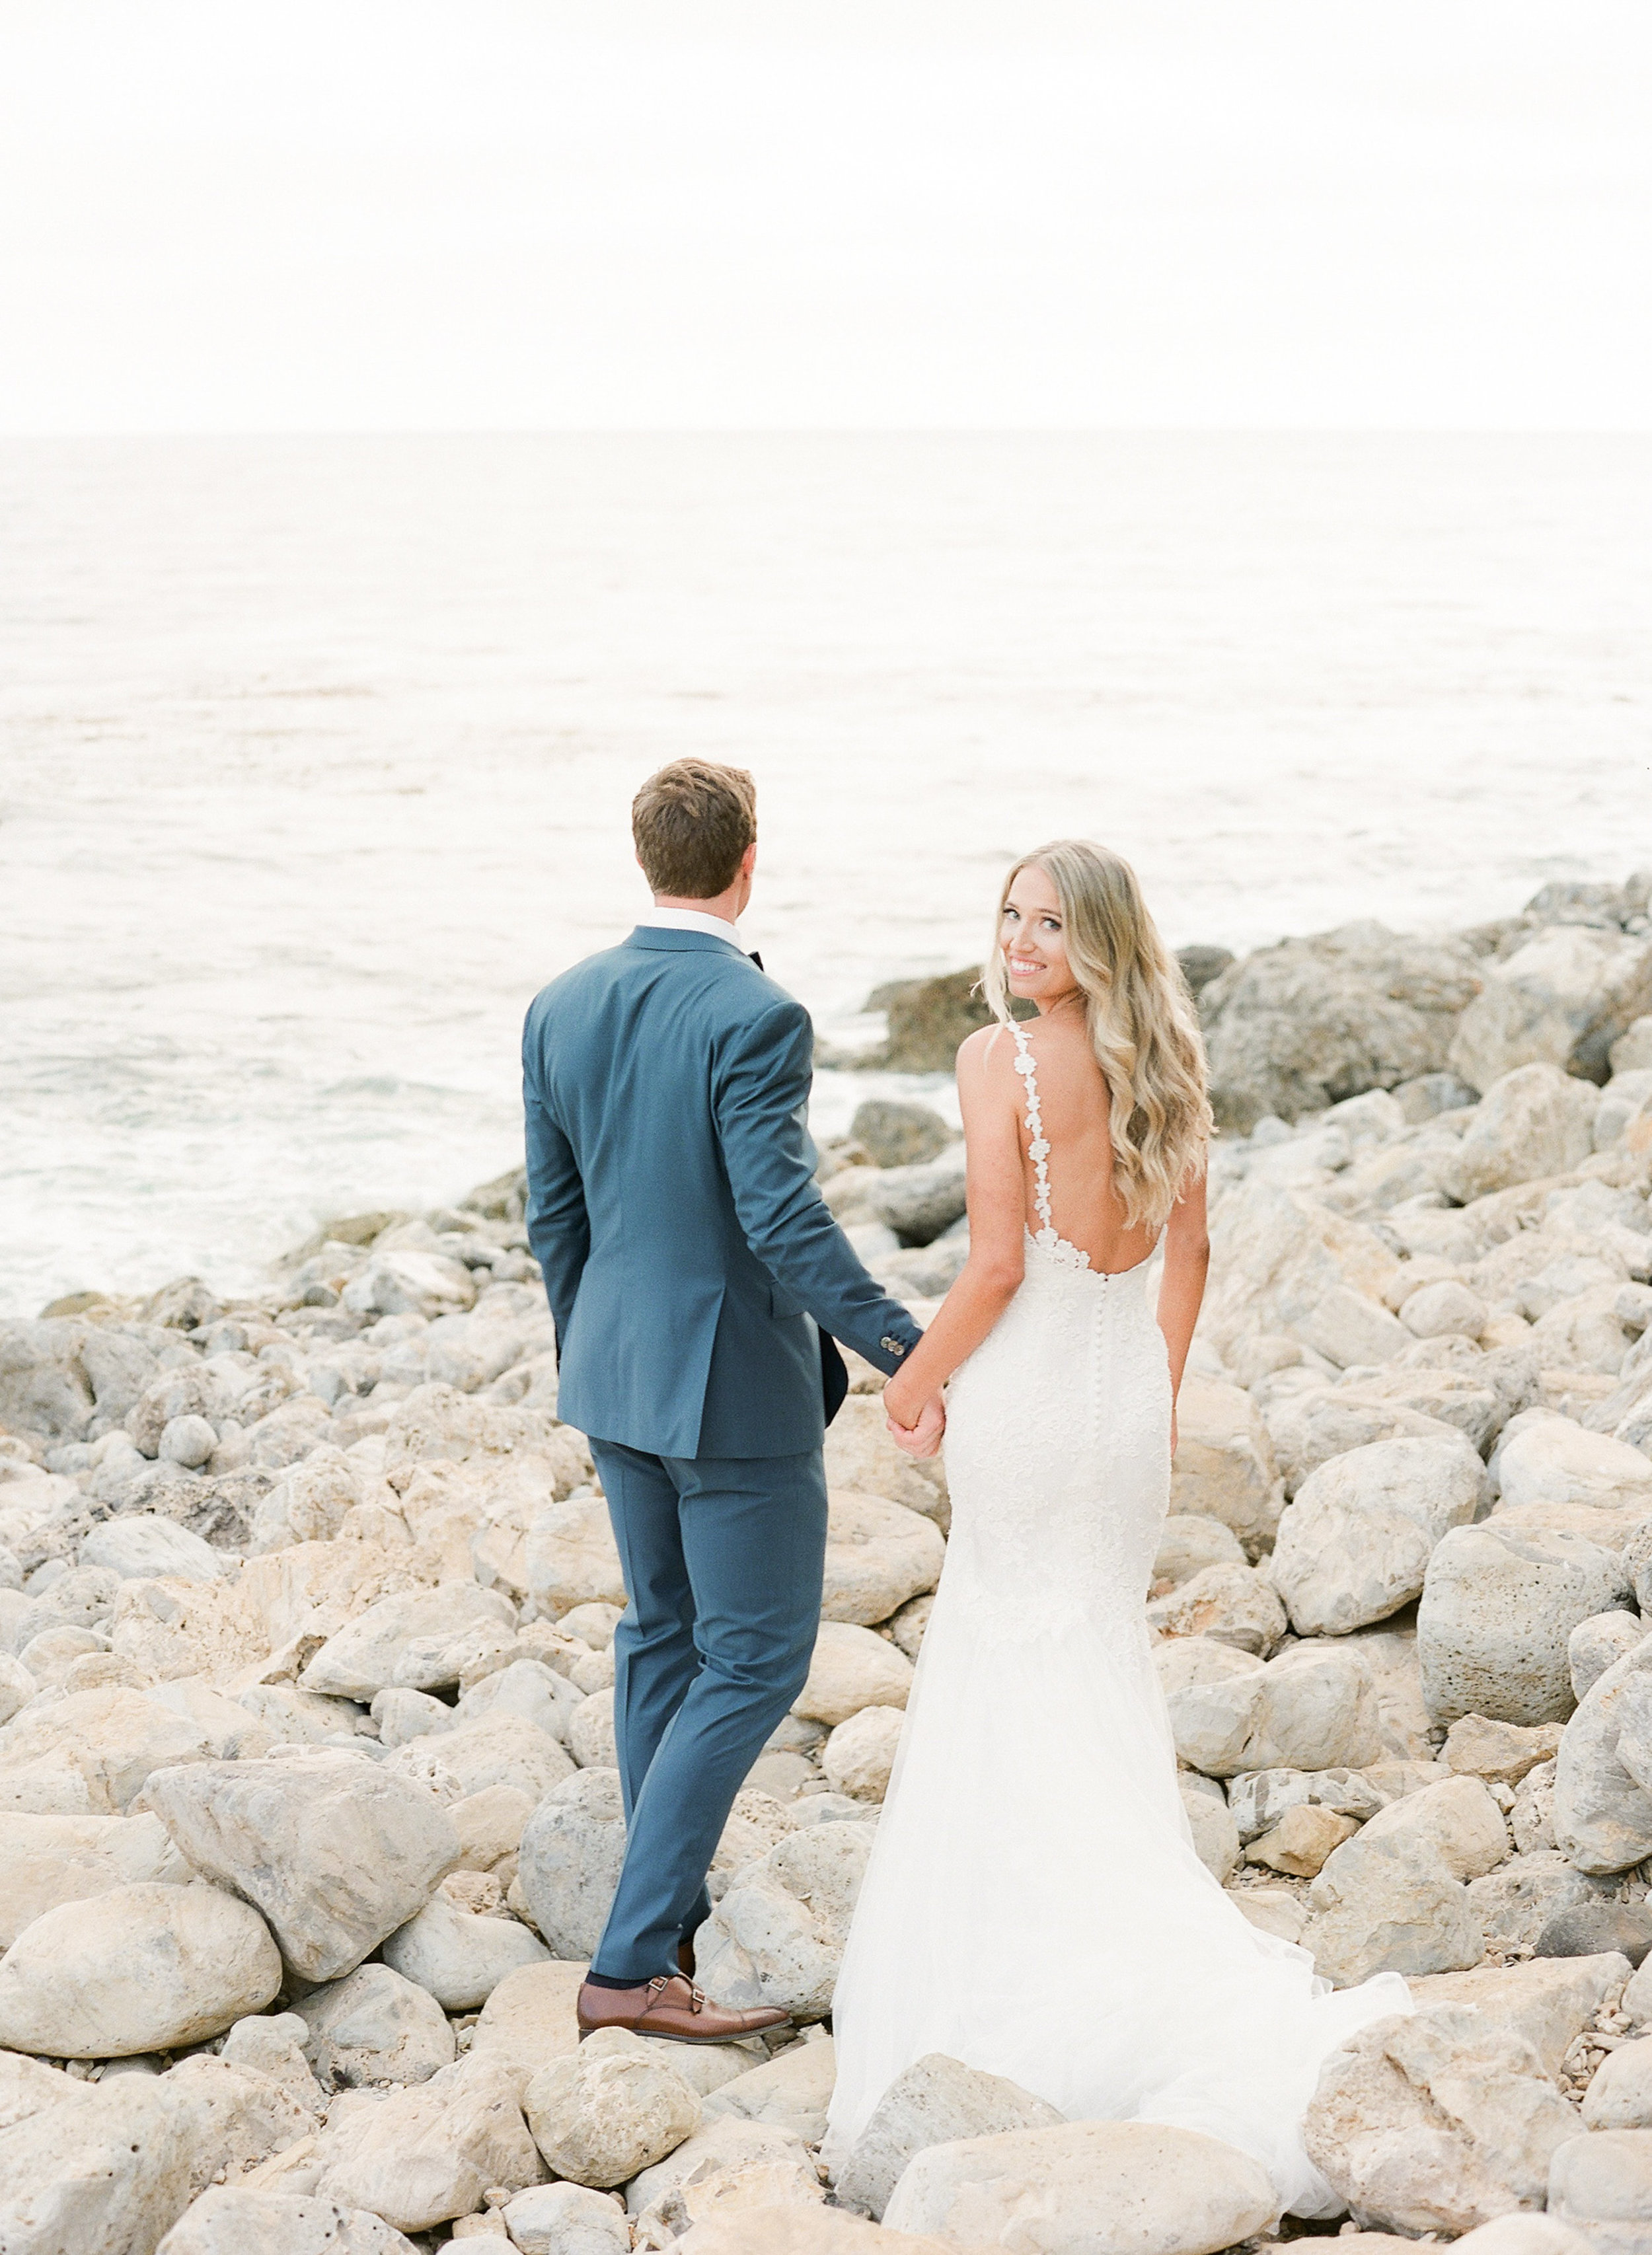 Terranea-Wedding-Palos-Verdes-678.jpg